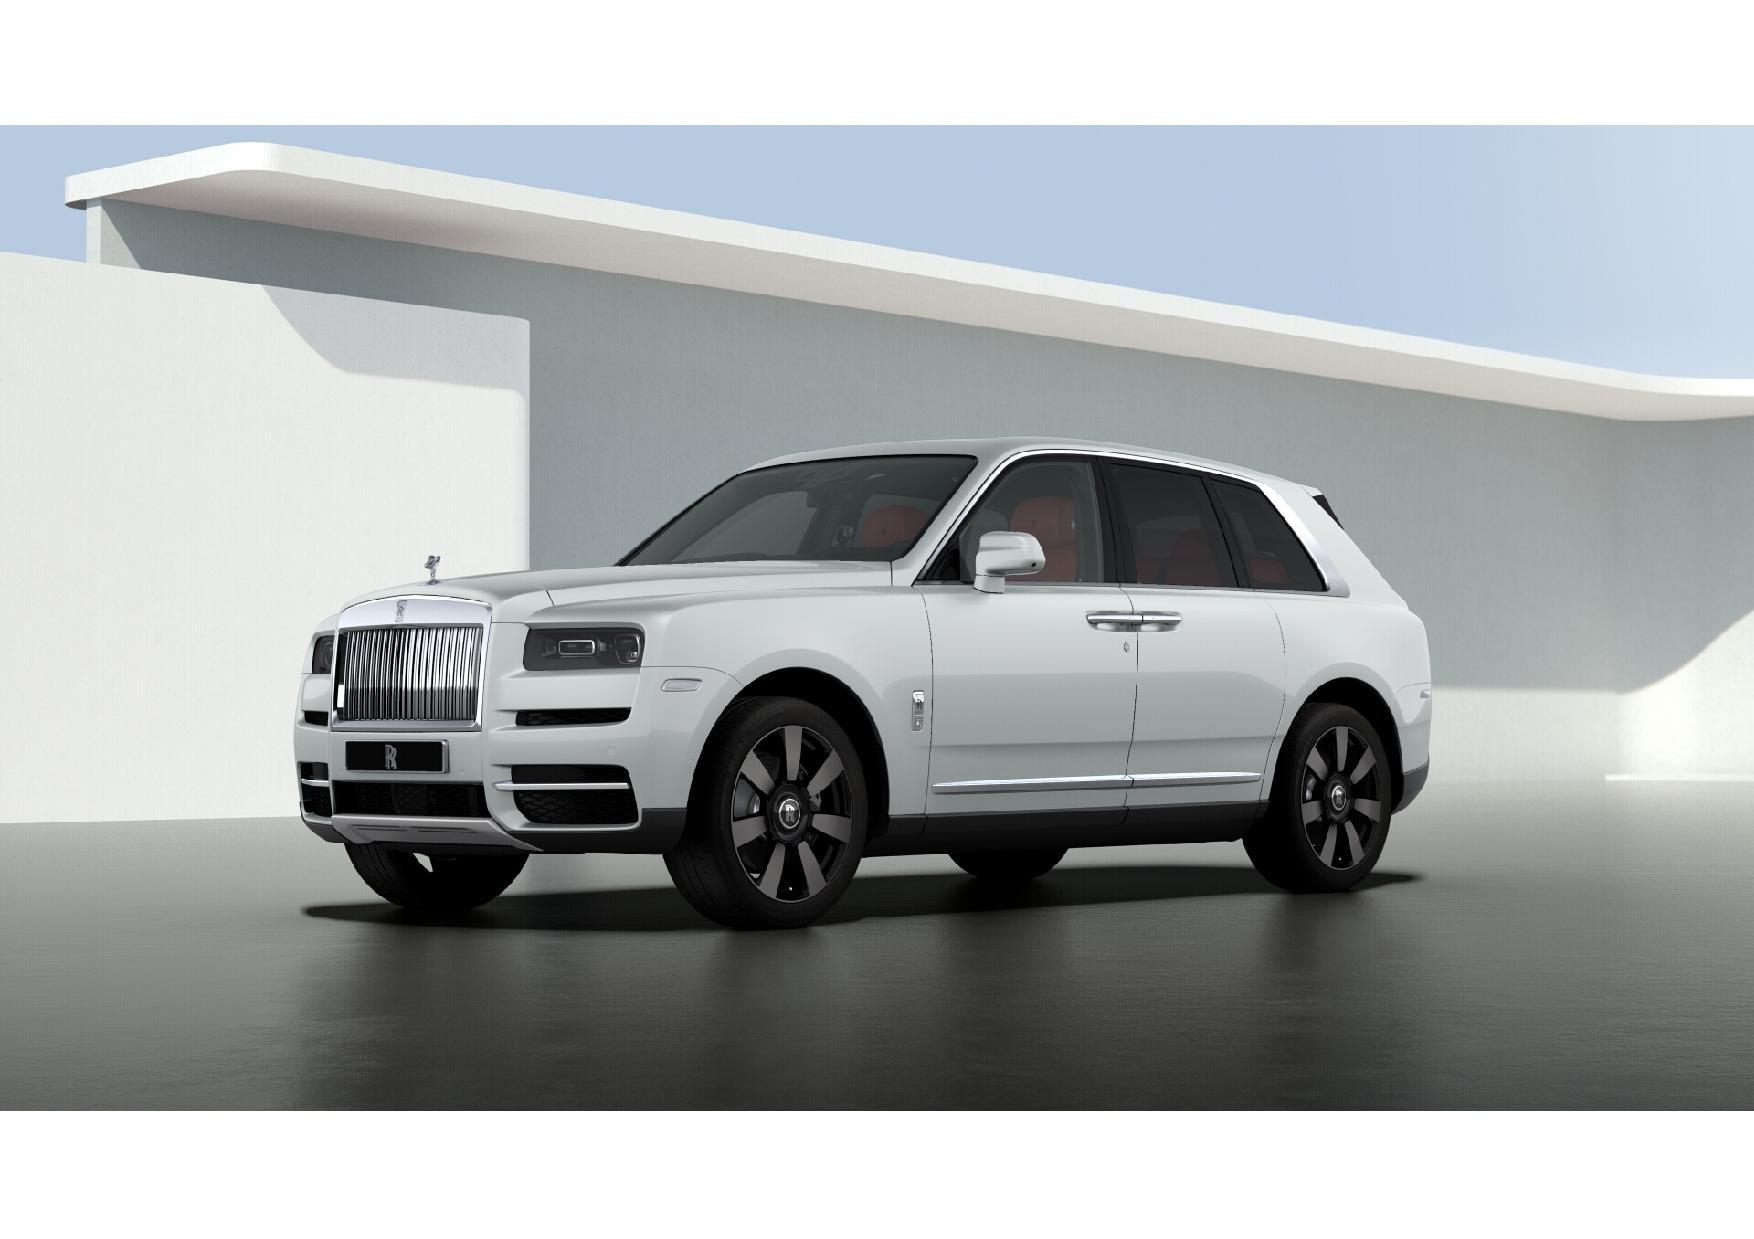 New 2021 Rolls-Royce Cullinan for sale $376,925 at Maserati of Westport in Westport CT 06880 1